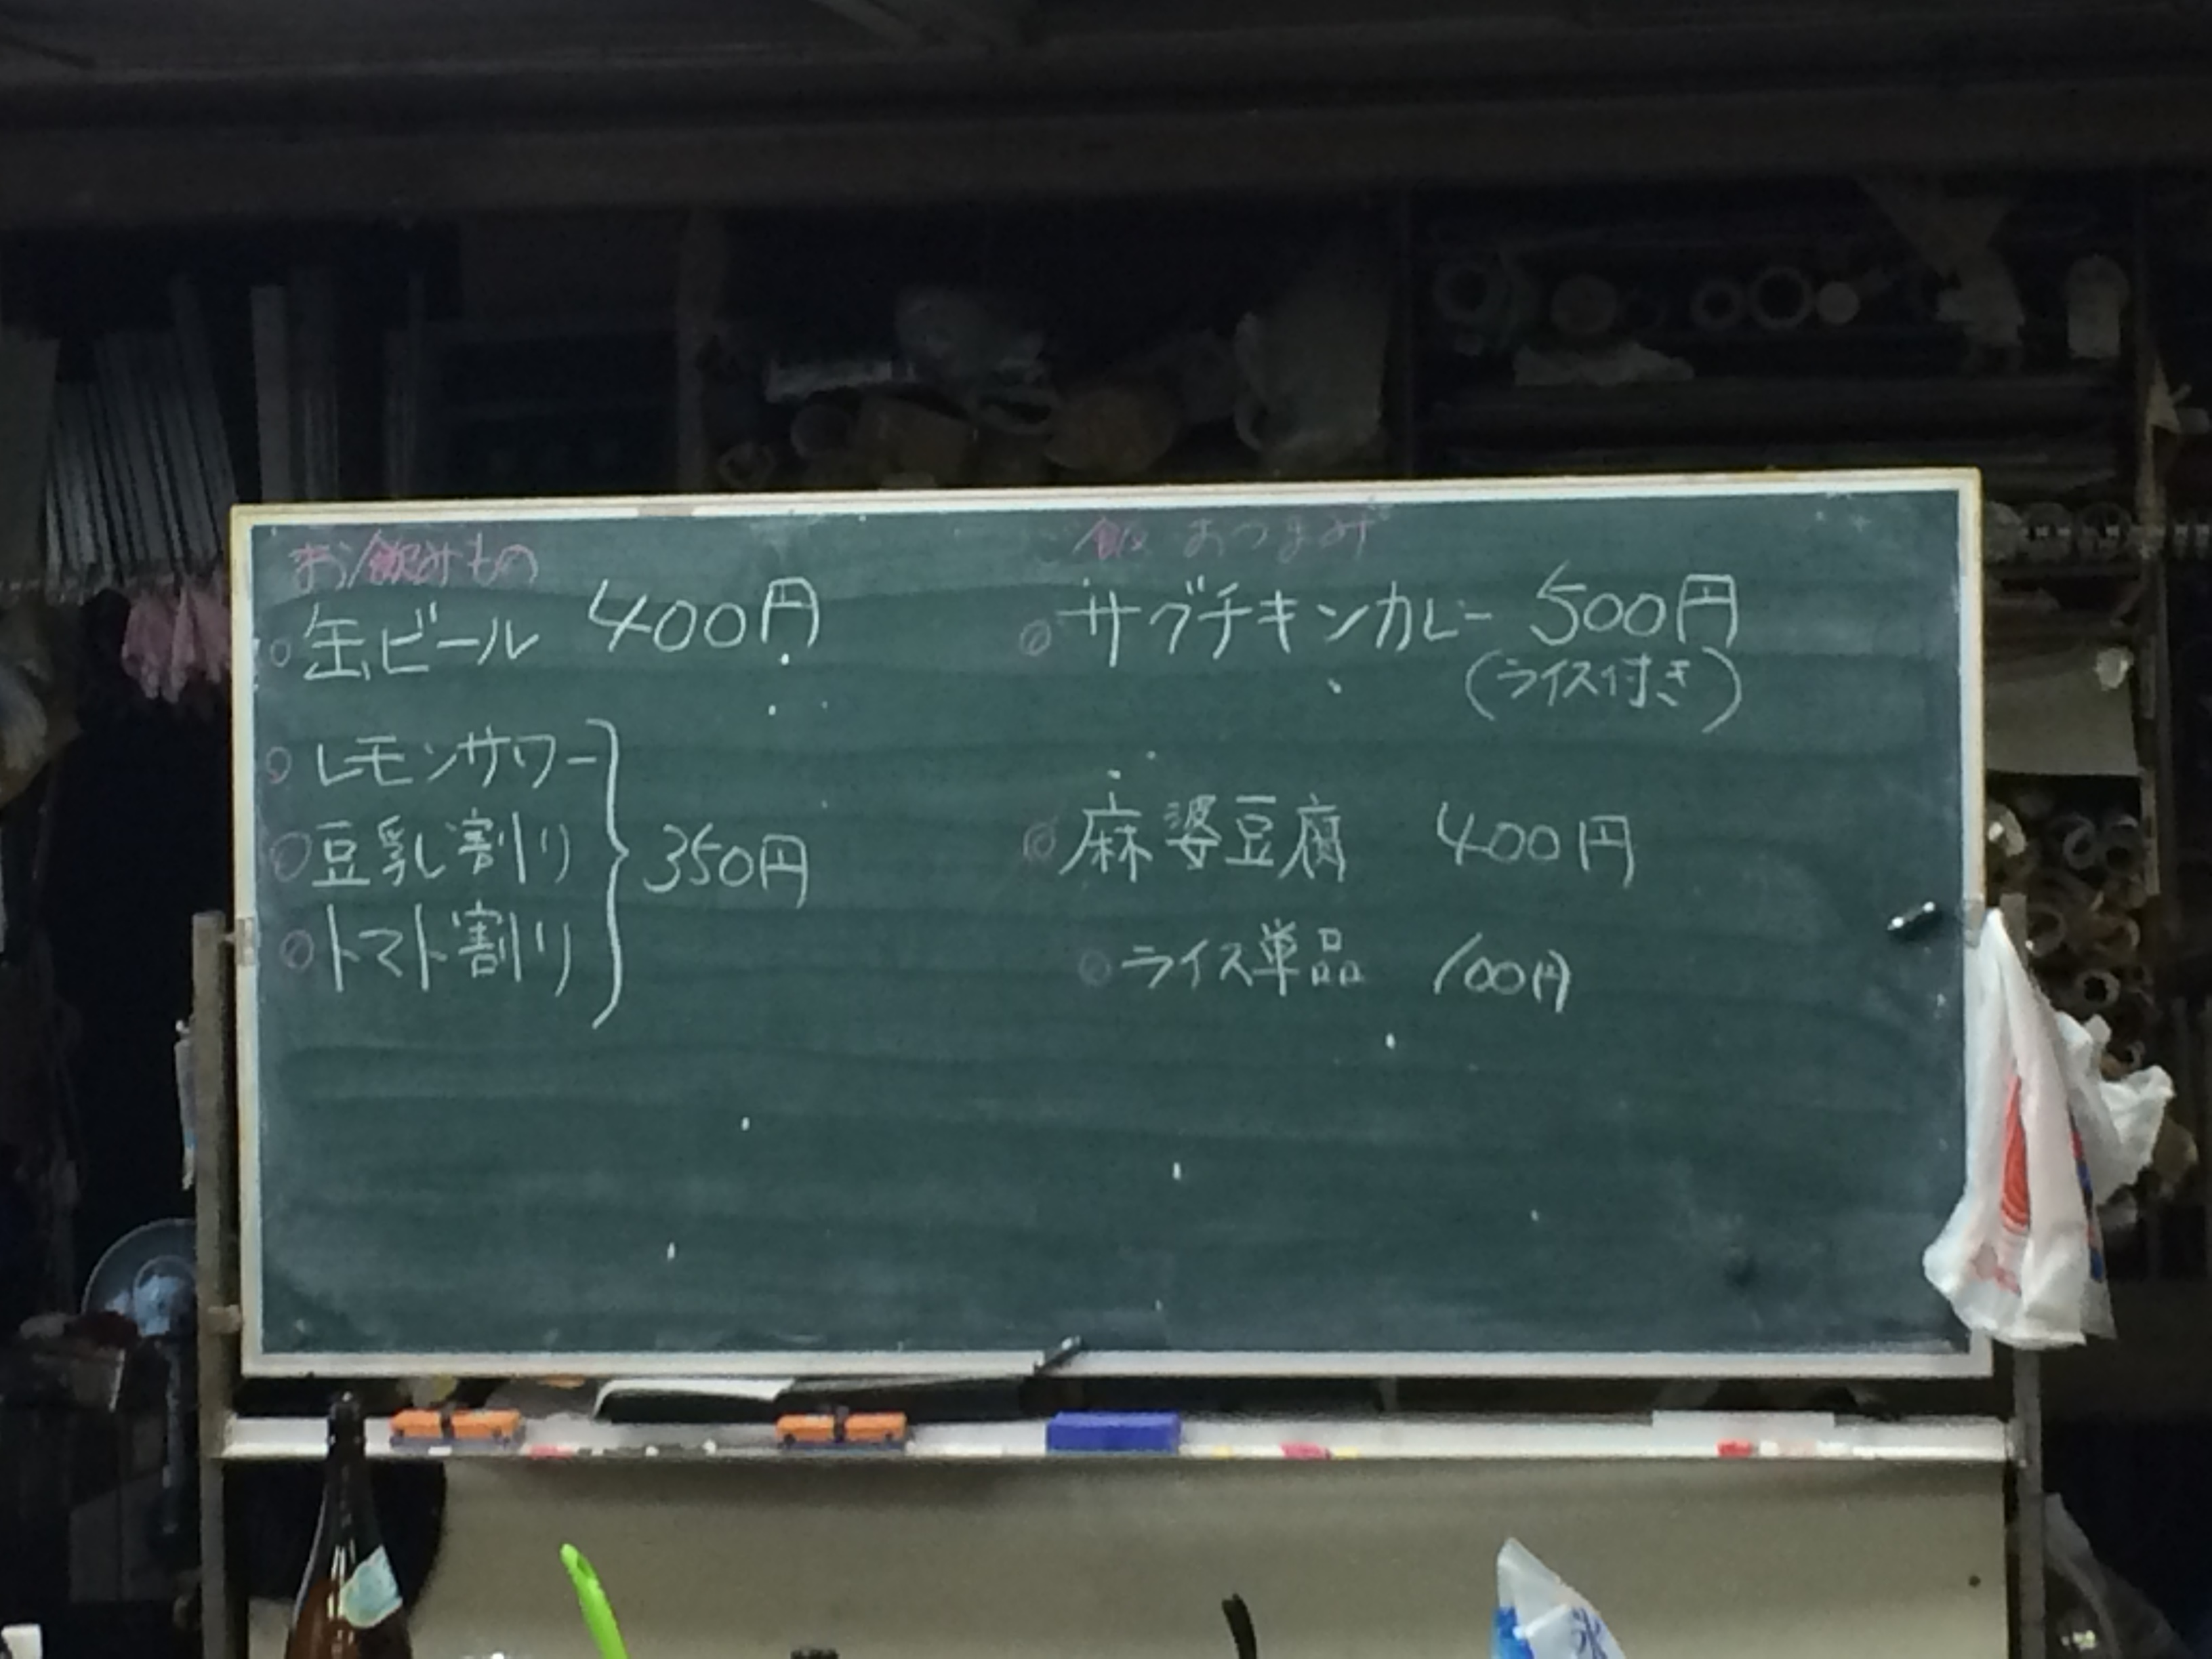 2015-03-01 12.55.14